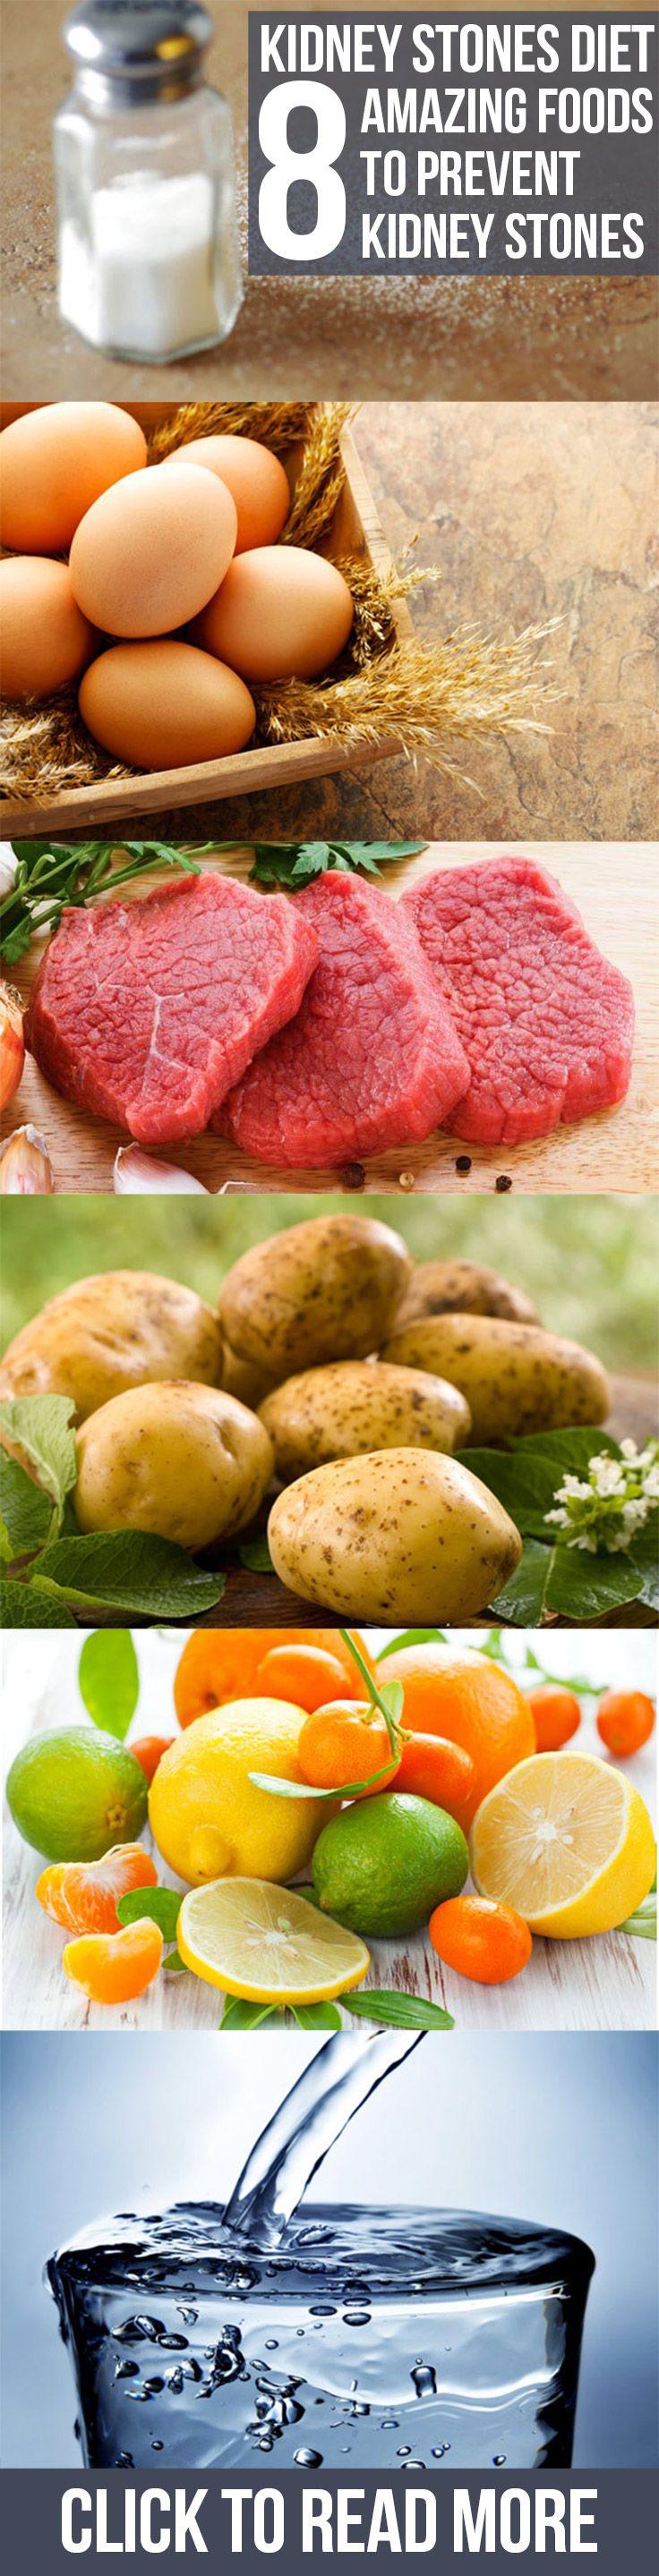 Kidney Stones Diet – 8 Amazing Foods To Prevent Kidney Stones